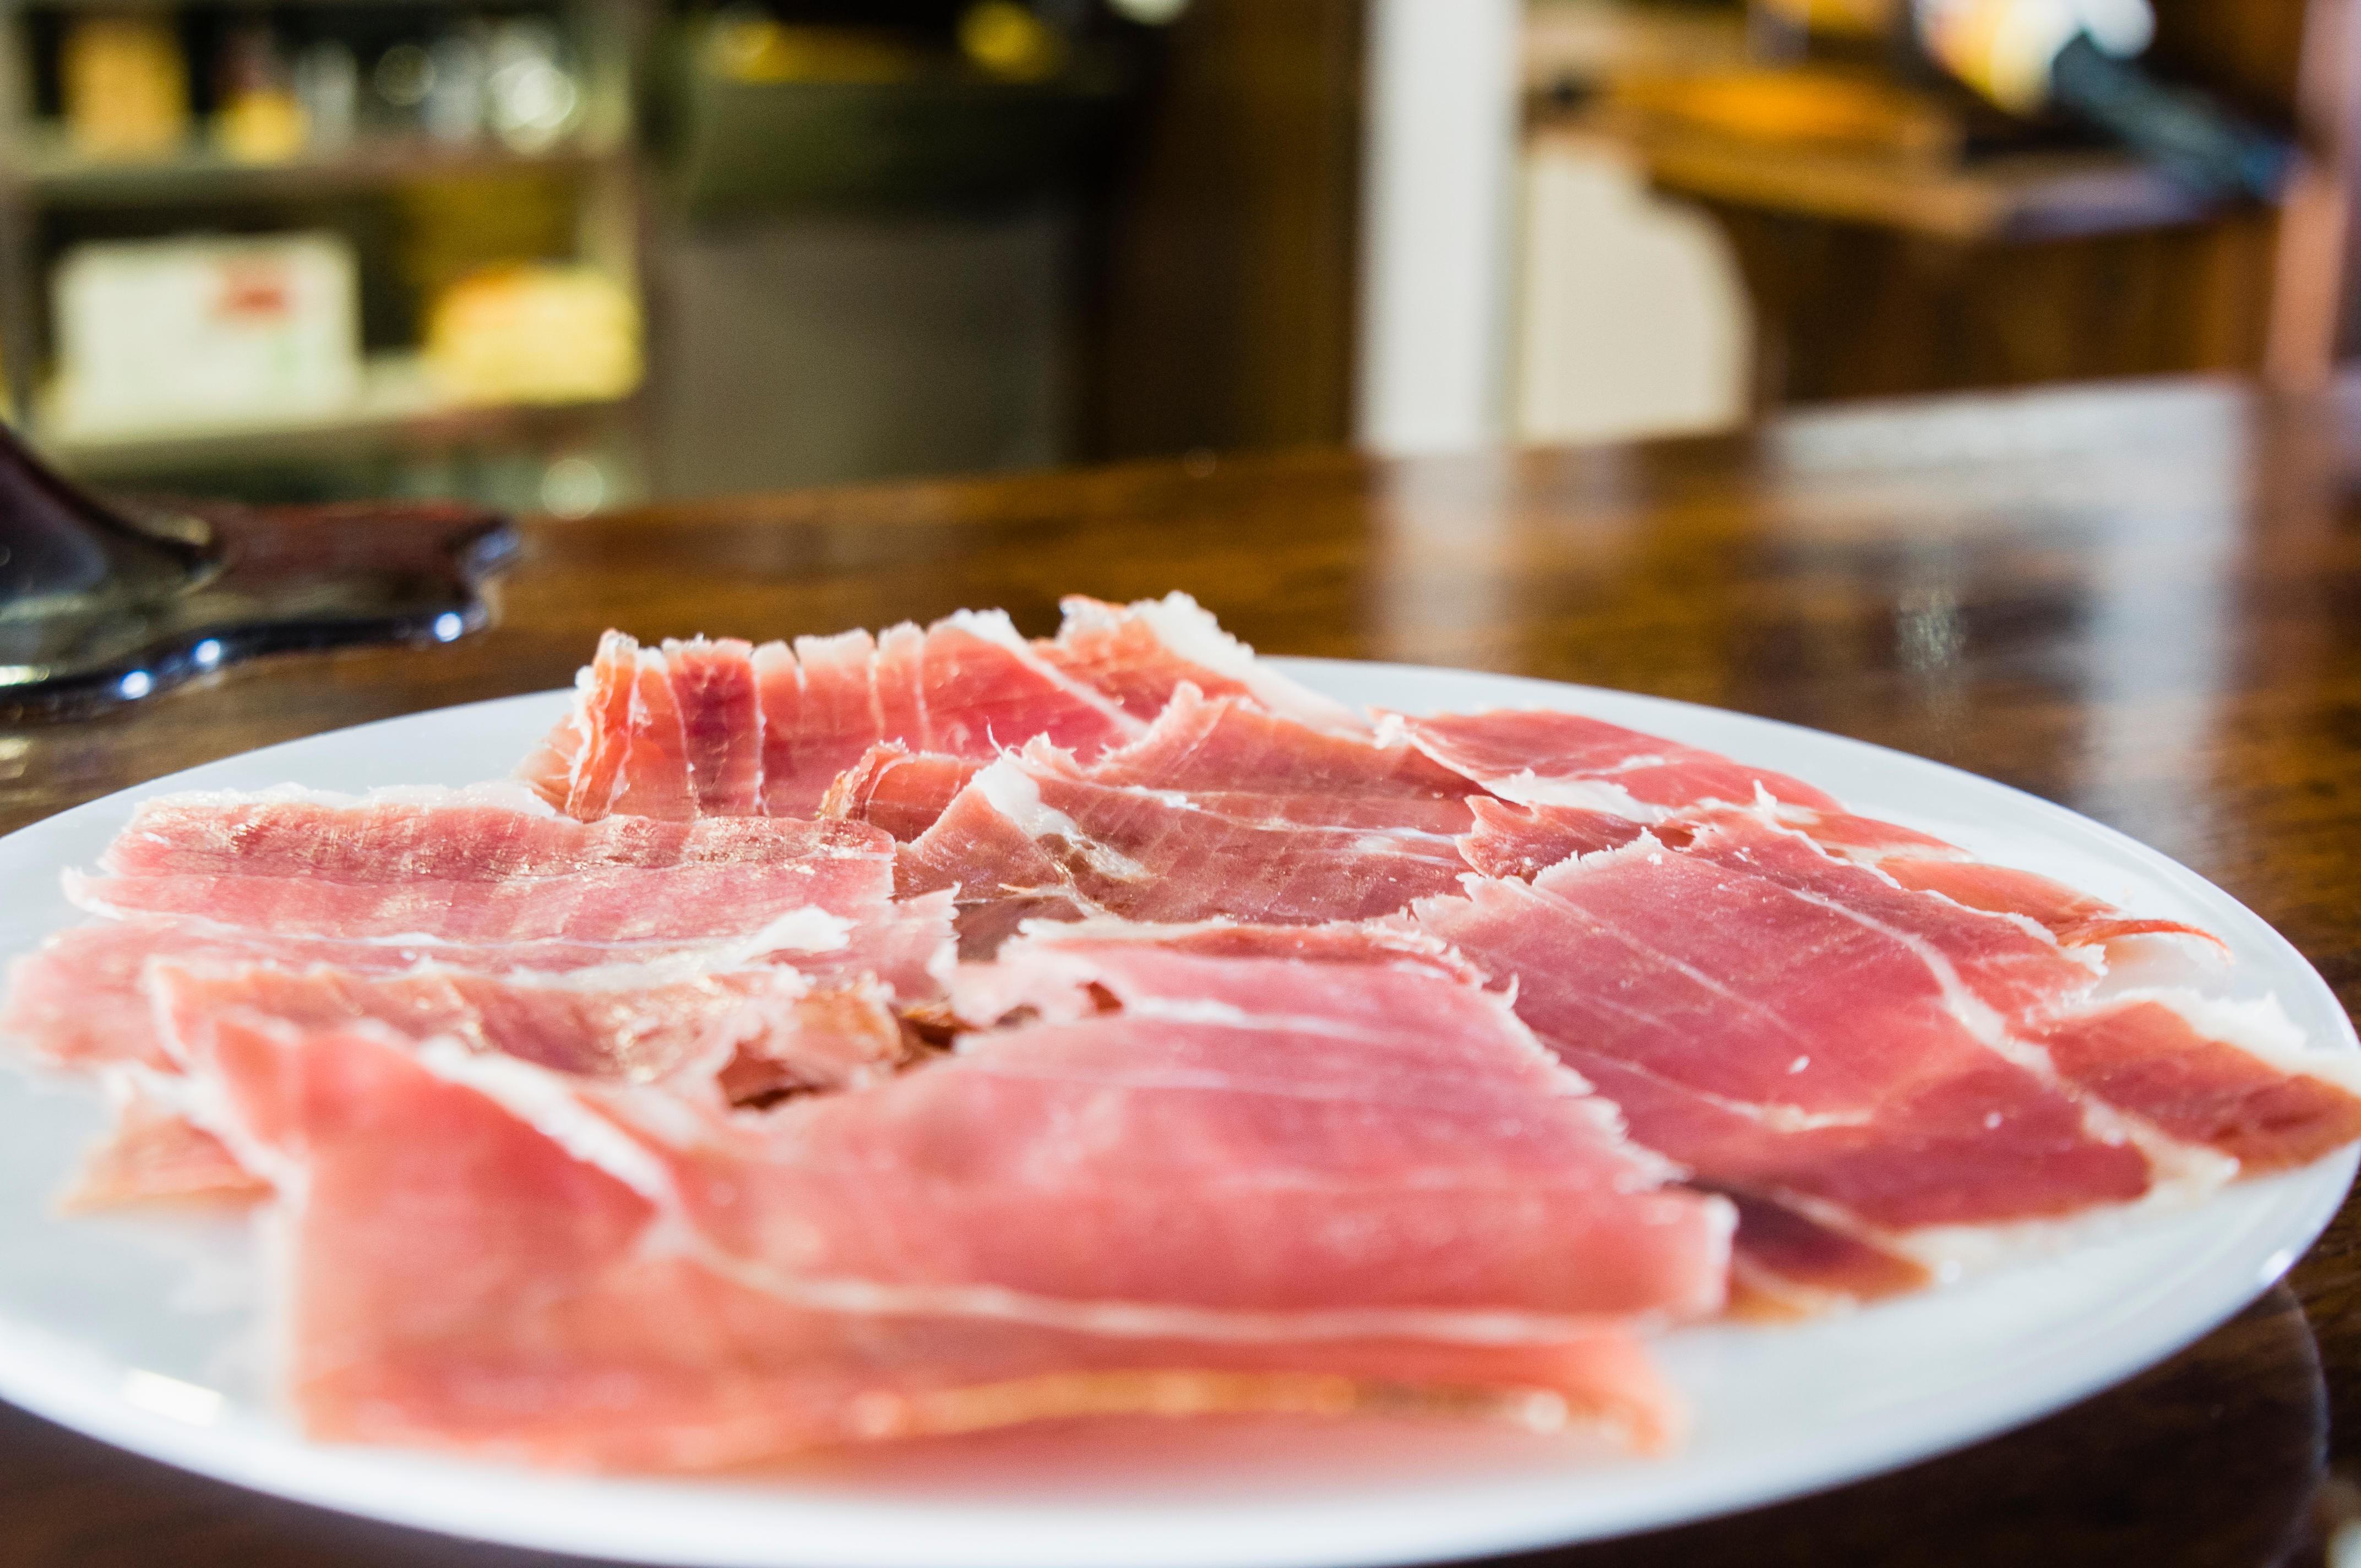 Spanish ham (Jamon iberico, Iberian ham, pata negra) cured ham served as a tapas in a bar